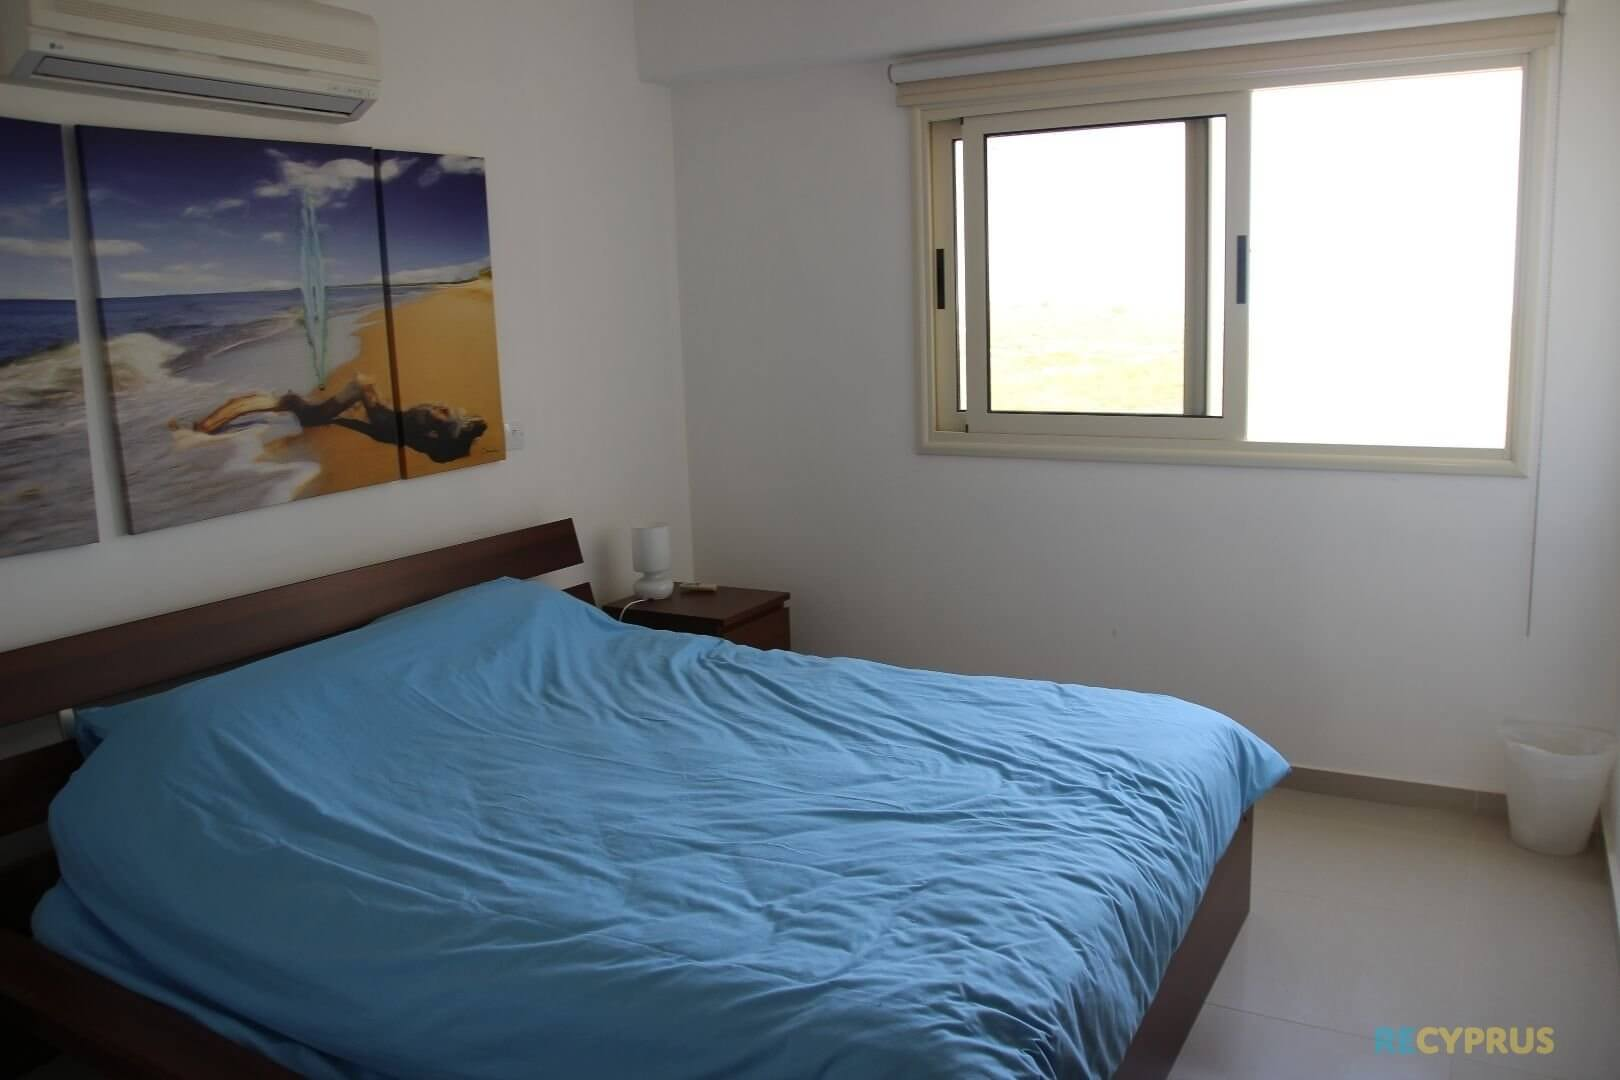 Apartment for sale Kapparis Famagusta Cyprus 5 3560